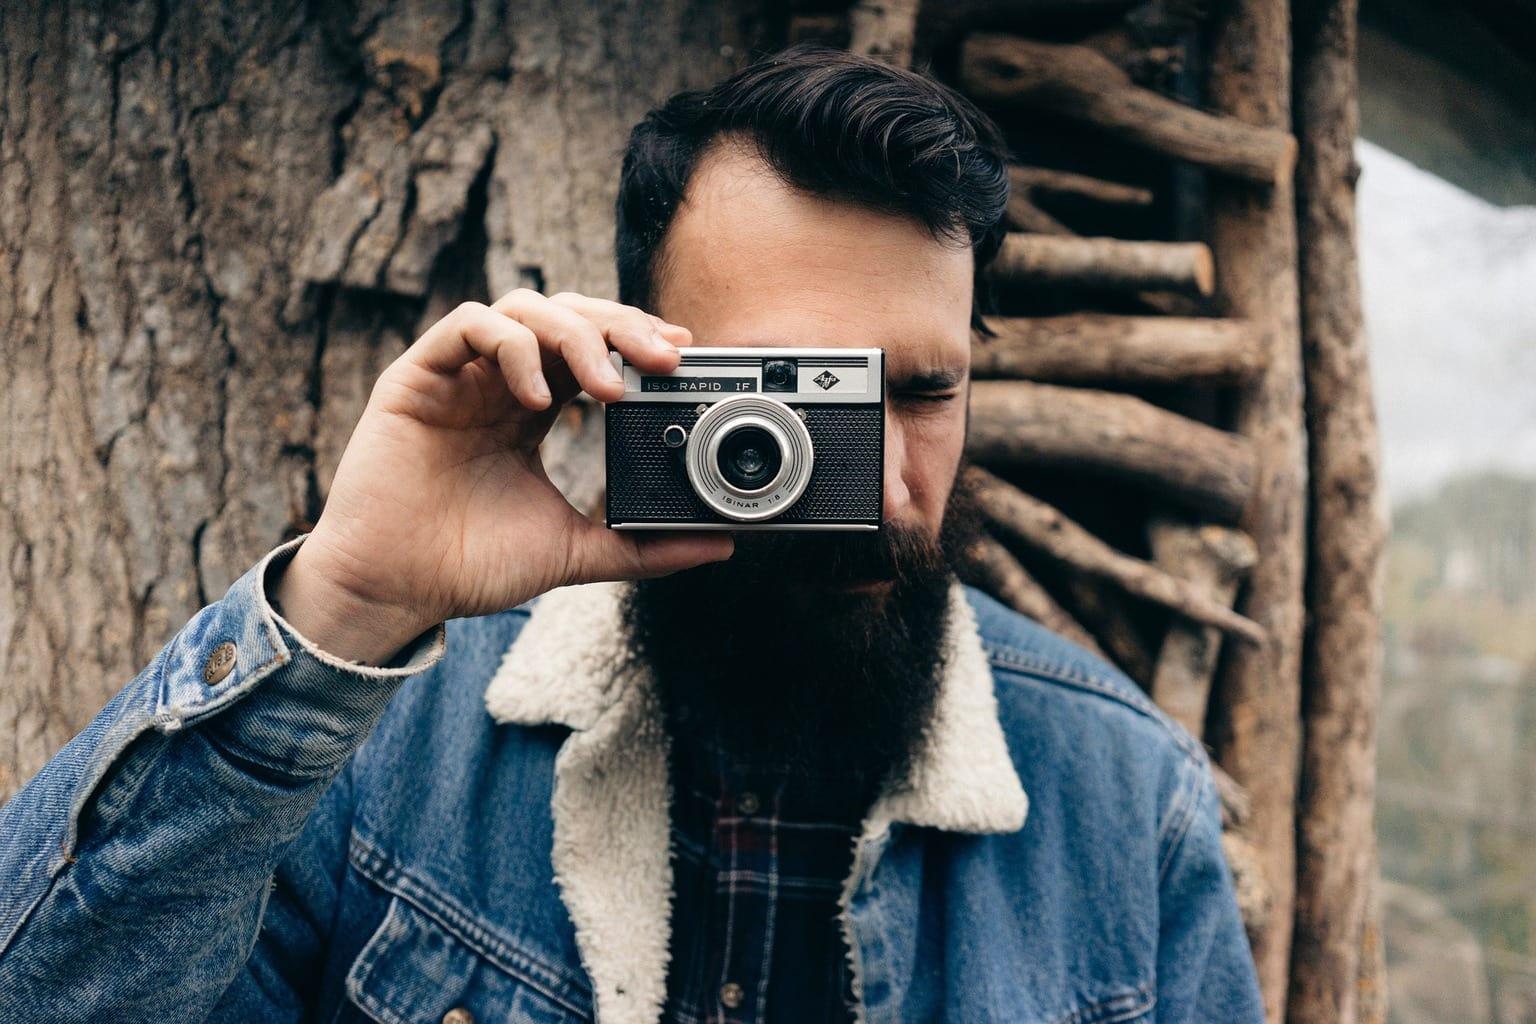 hombre con barba mirándo a través del visor de cámara